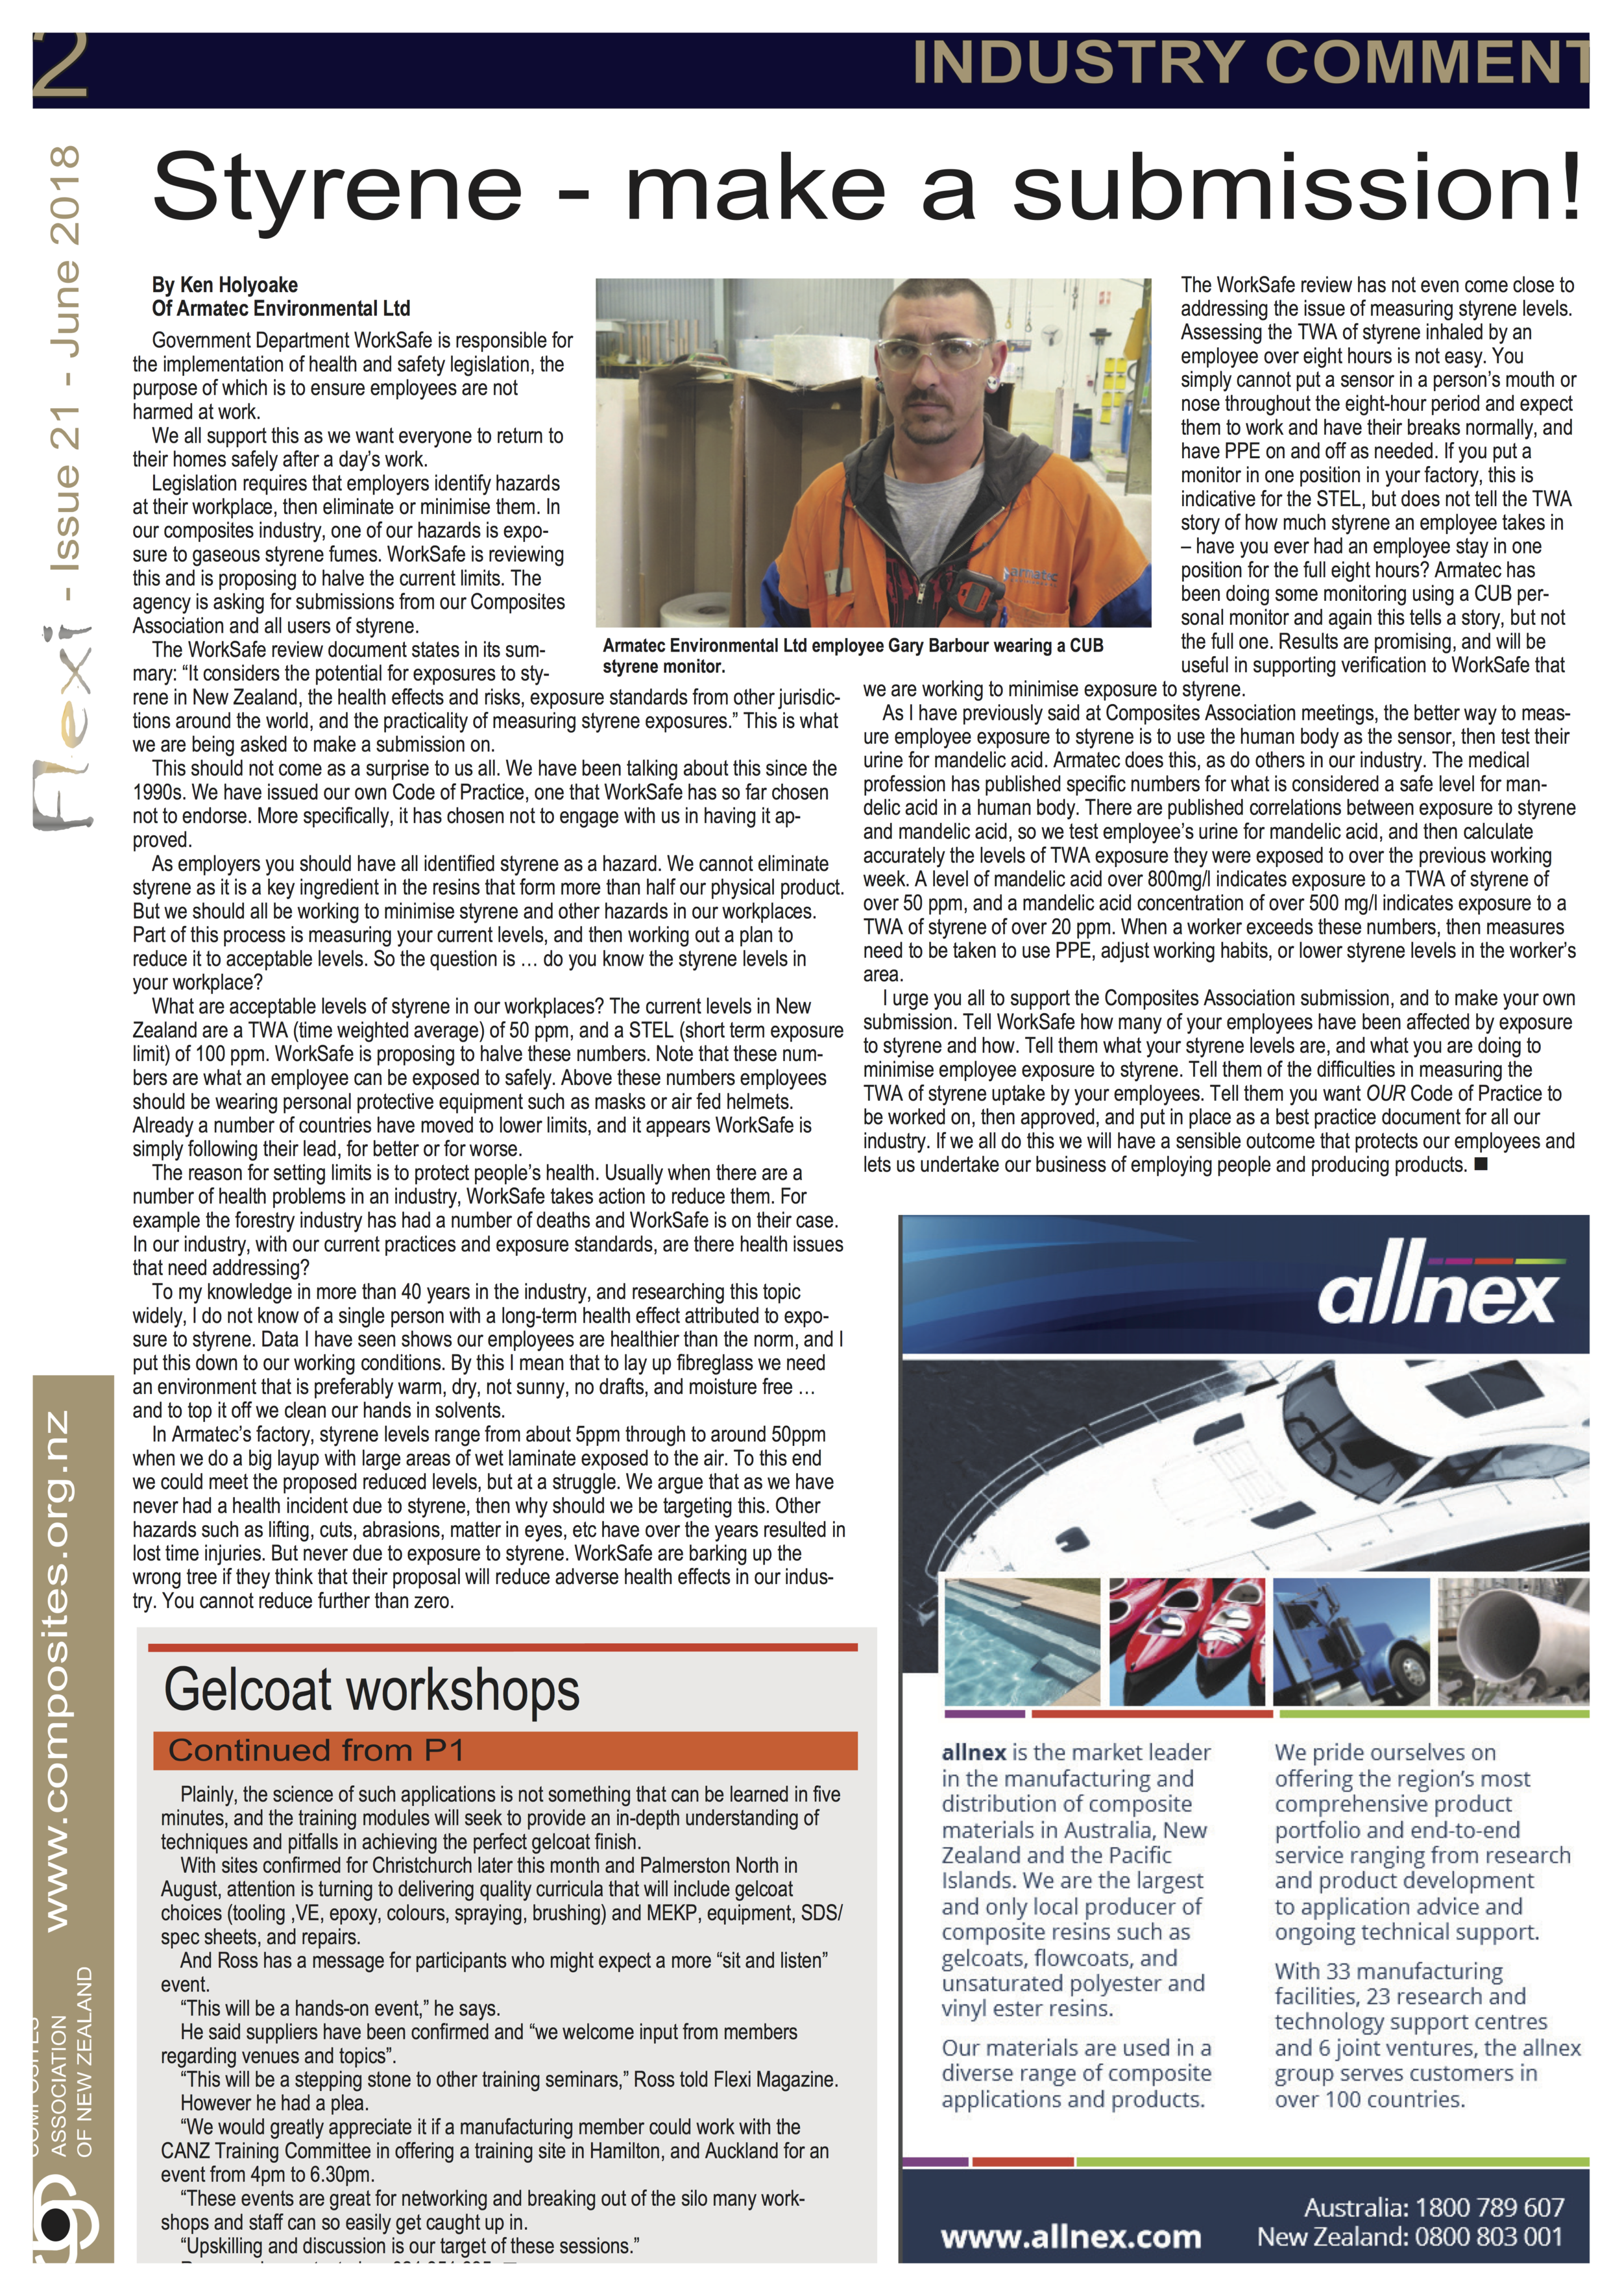 Flexi June 2018 Styrene Article Ken Holyoake 500 png.png